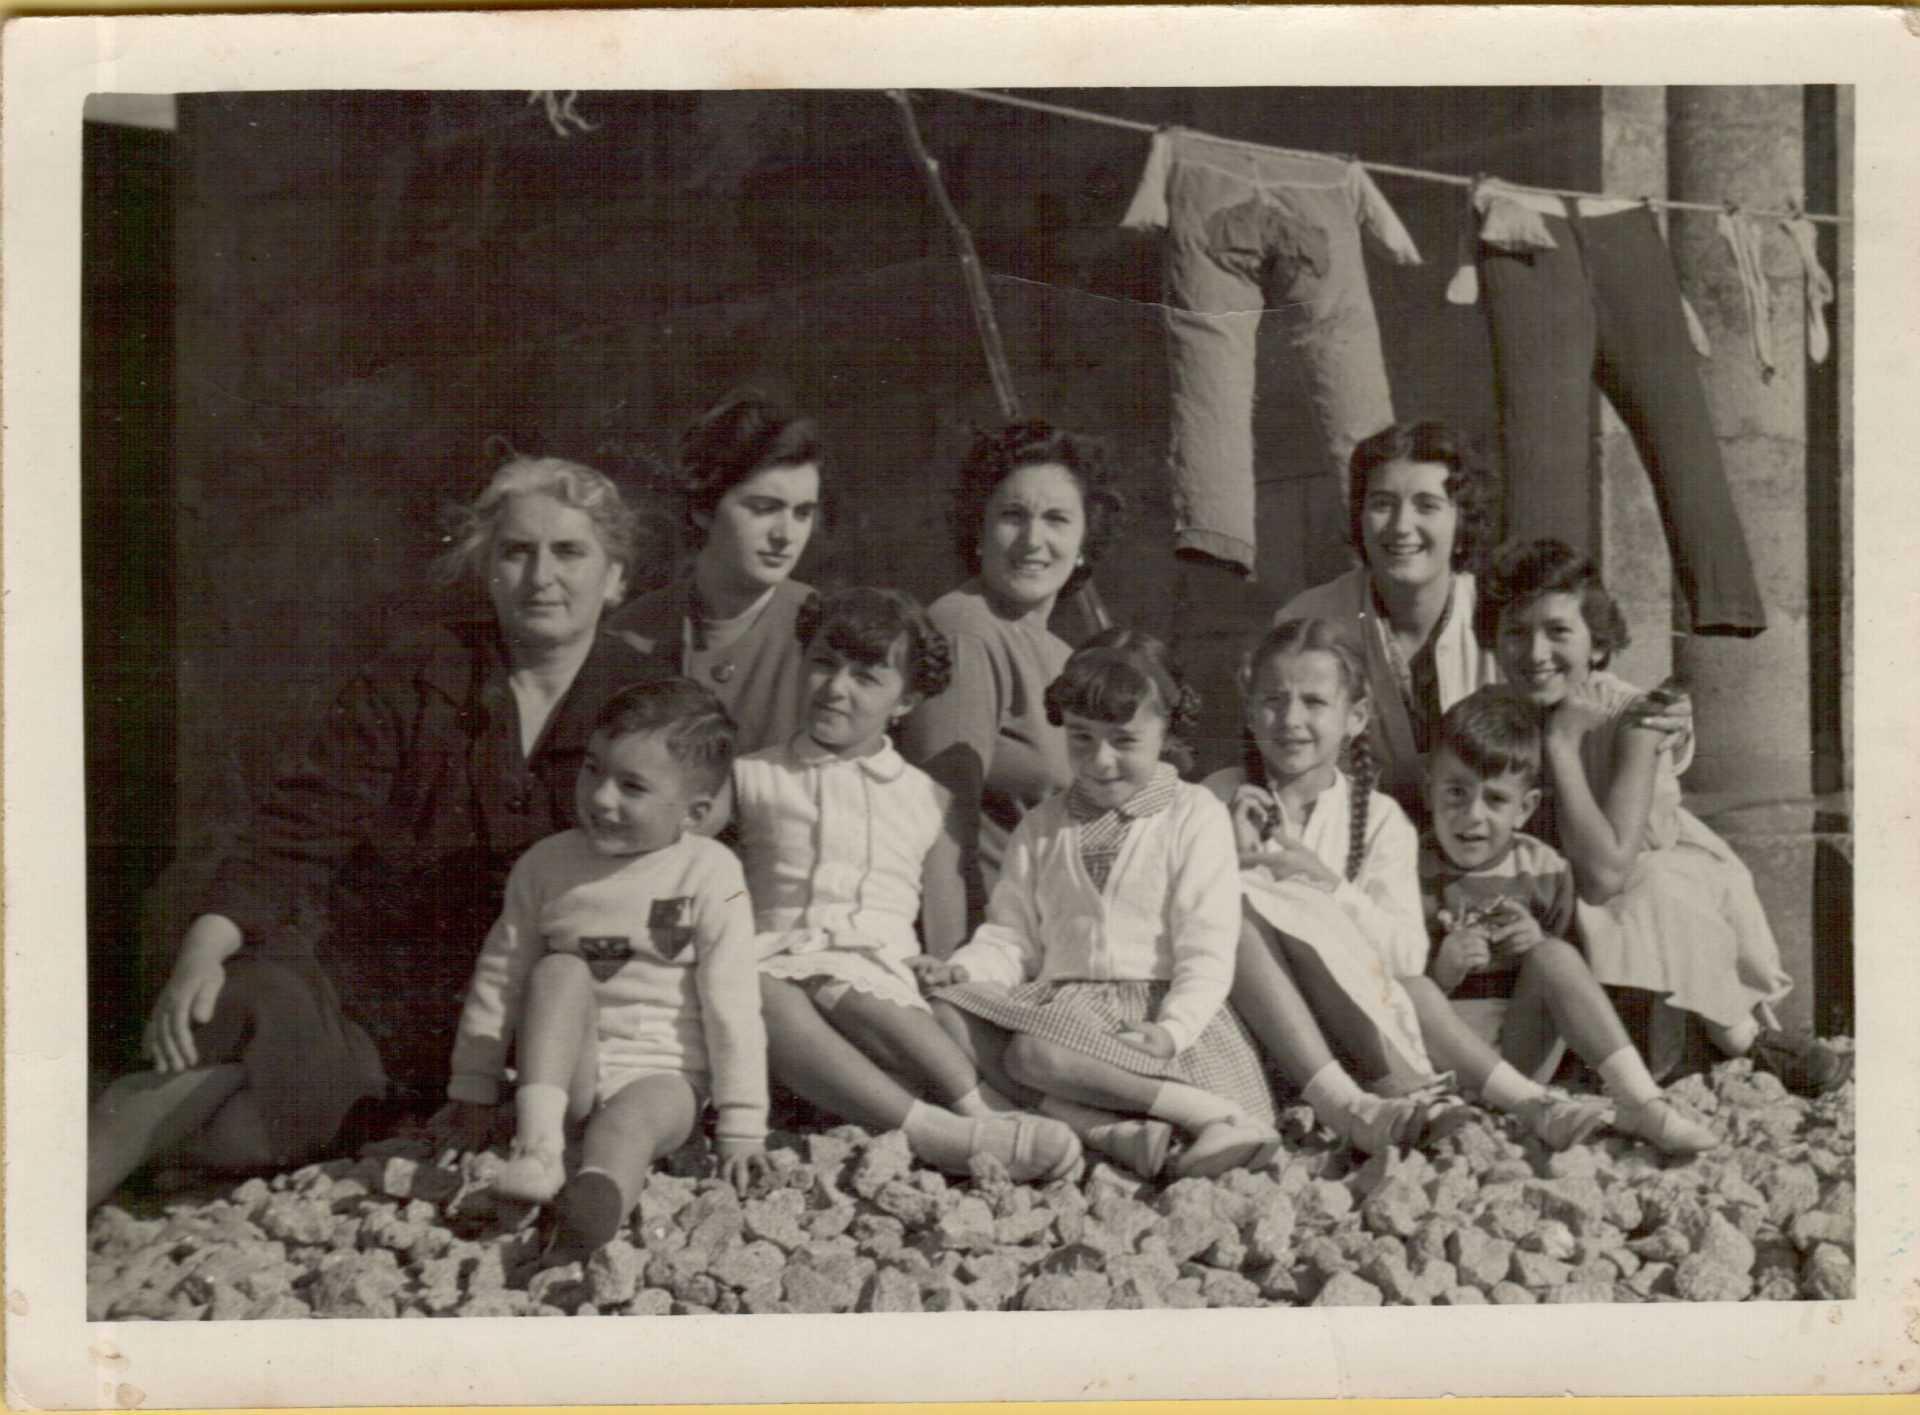 Lola Lois cos nenos na praia